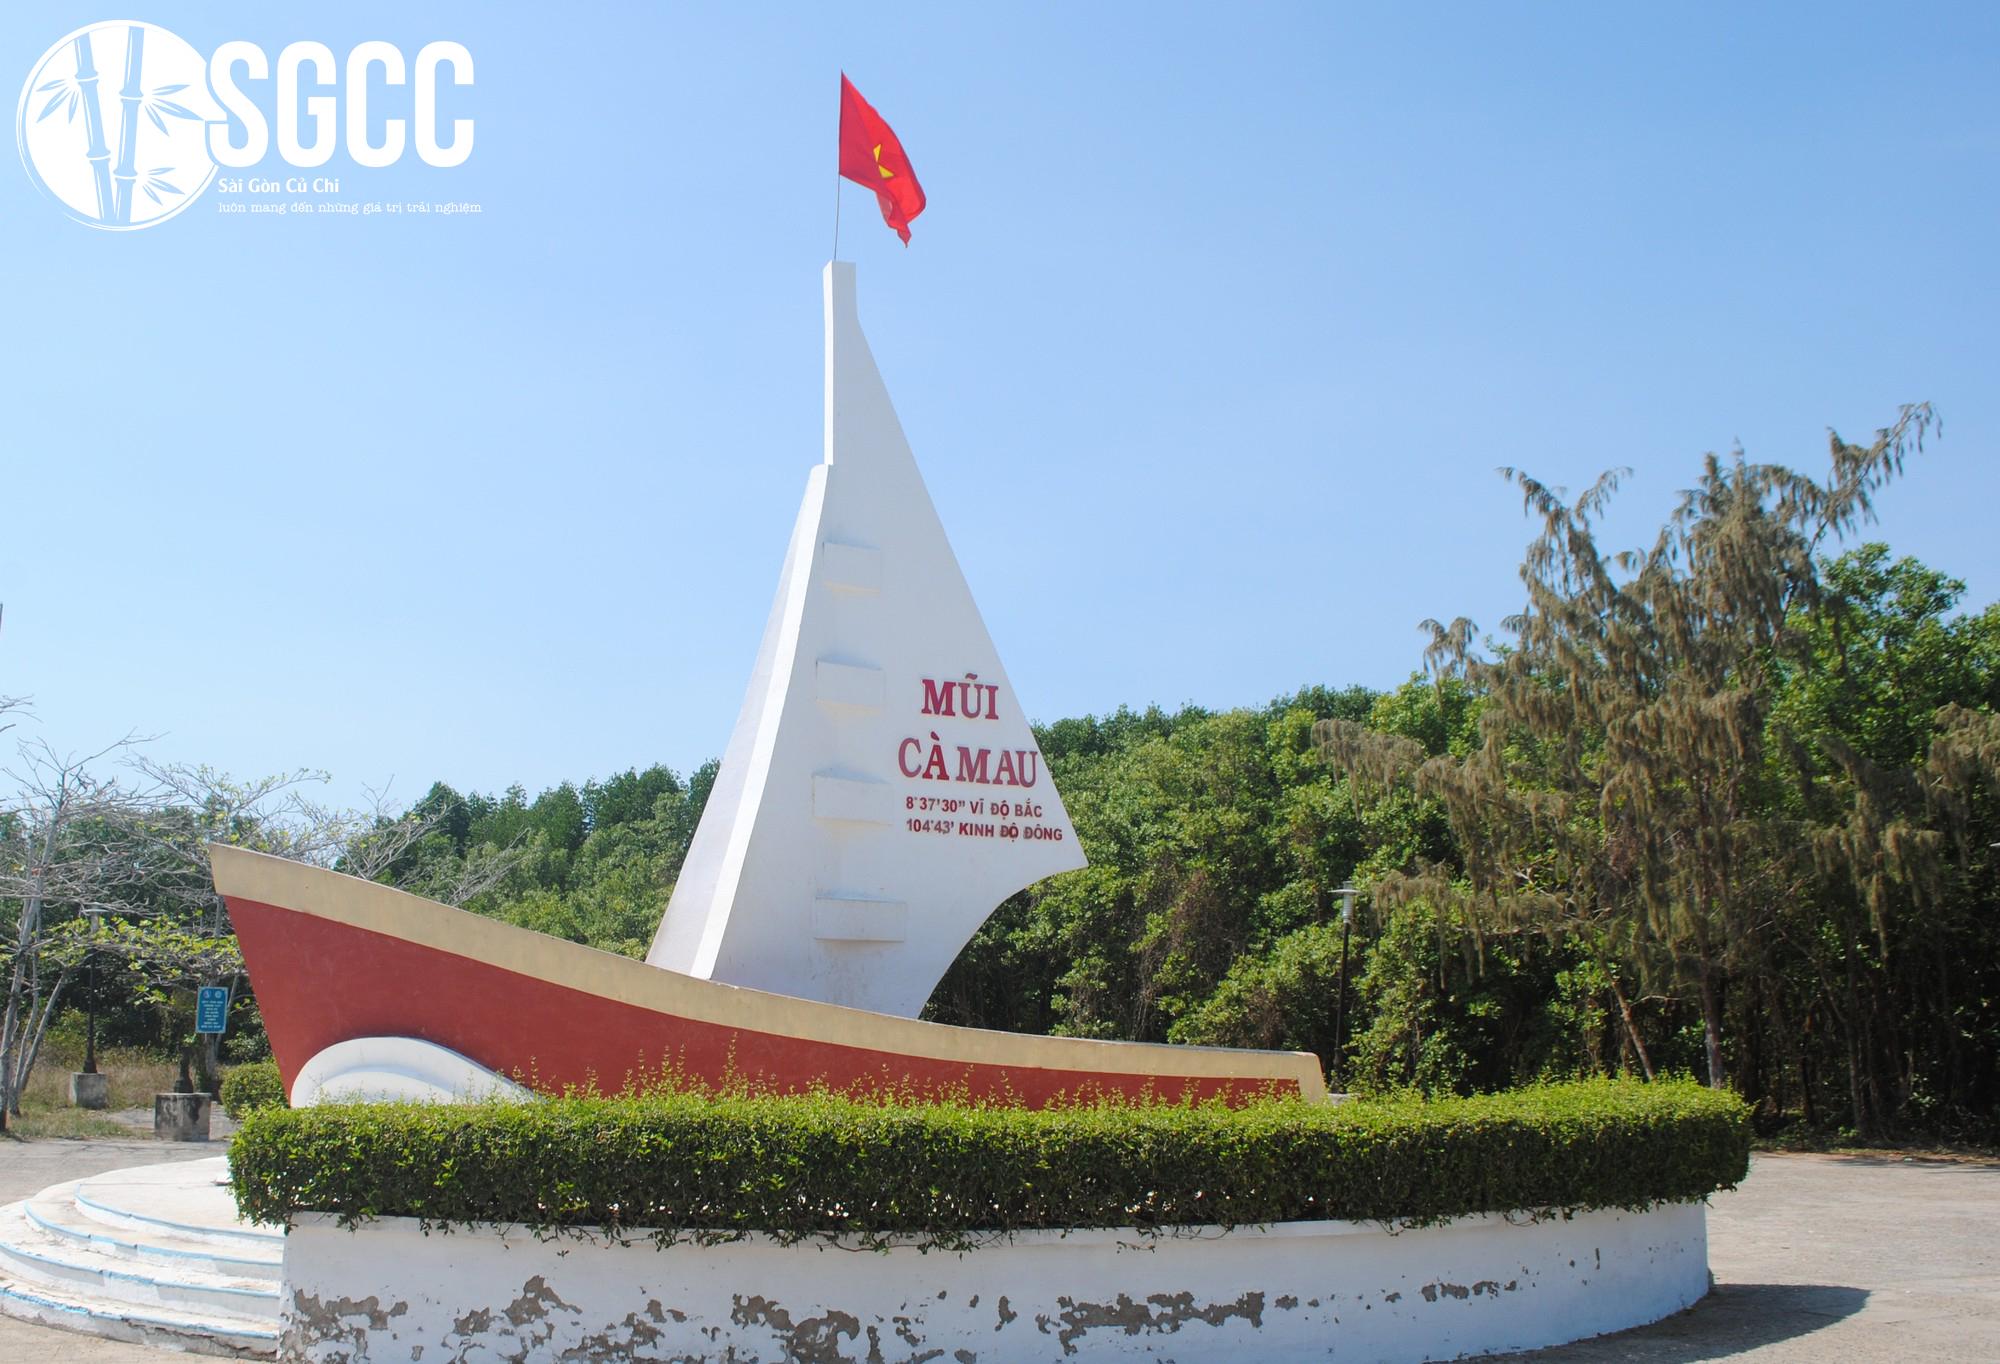 Du lịch Sài Gòn Cà Mau